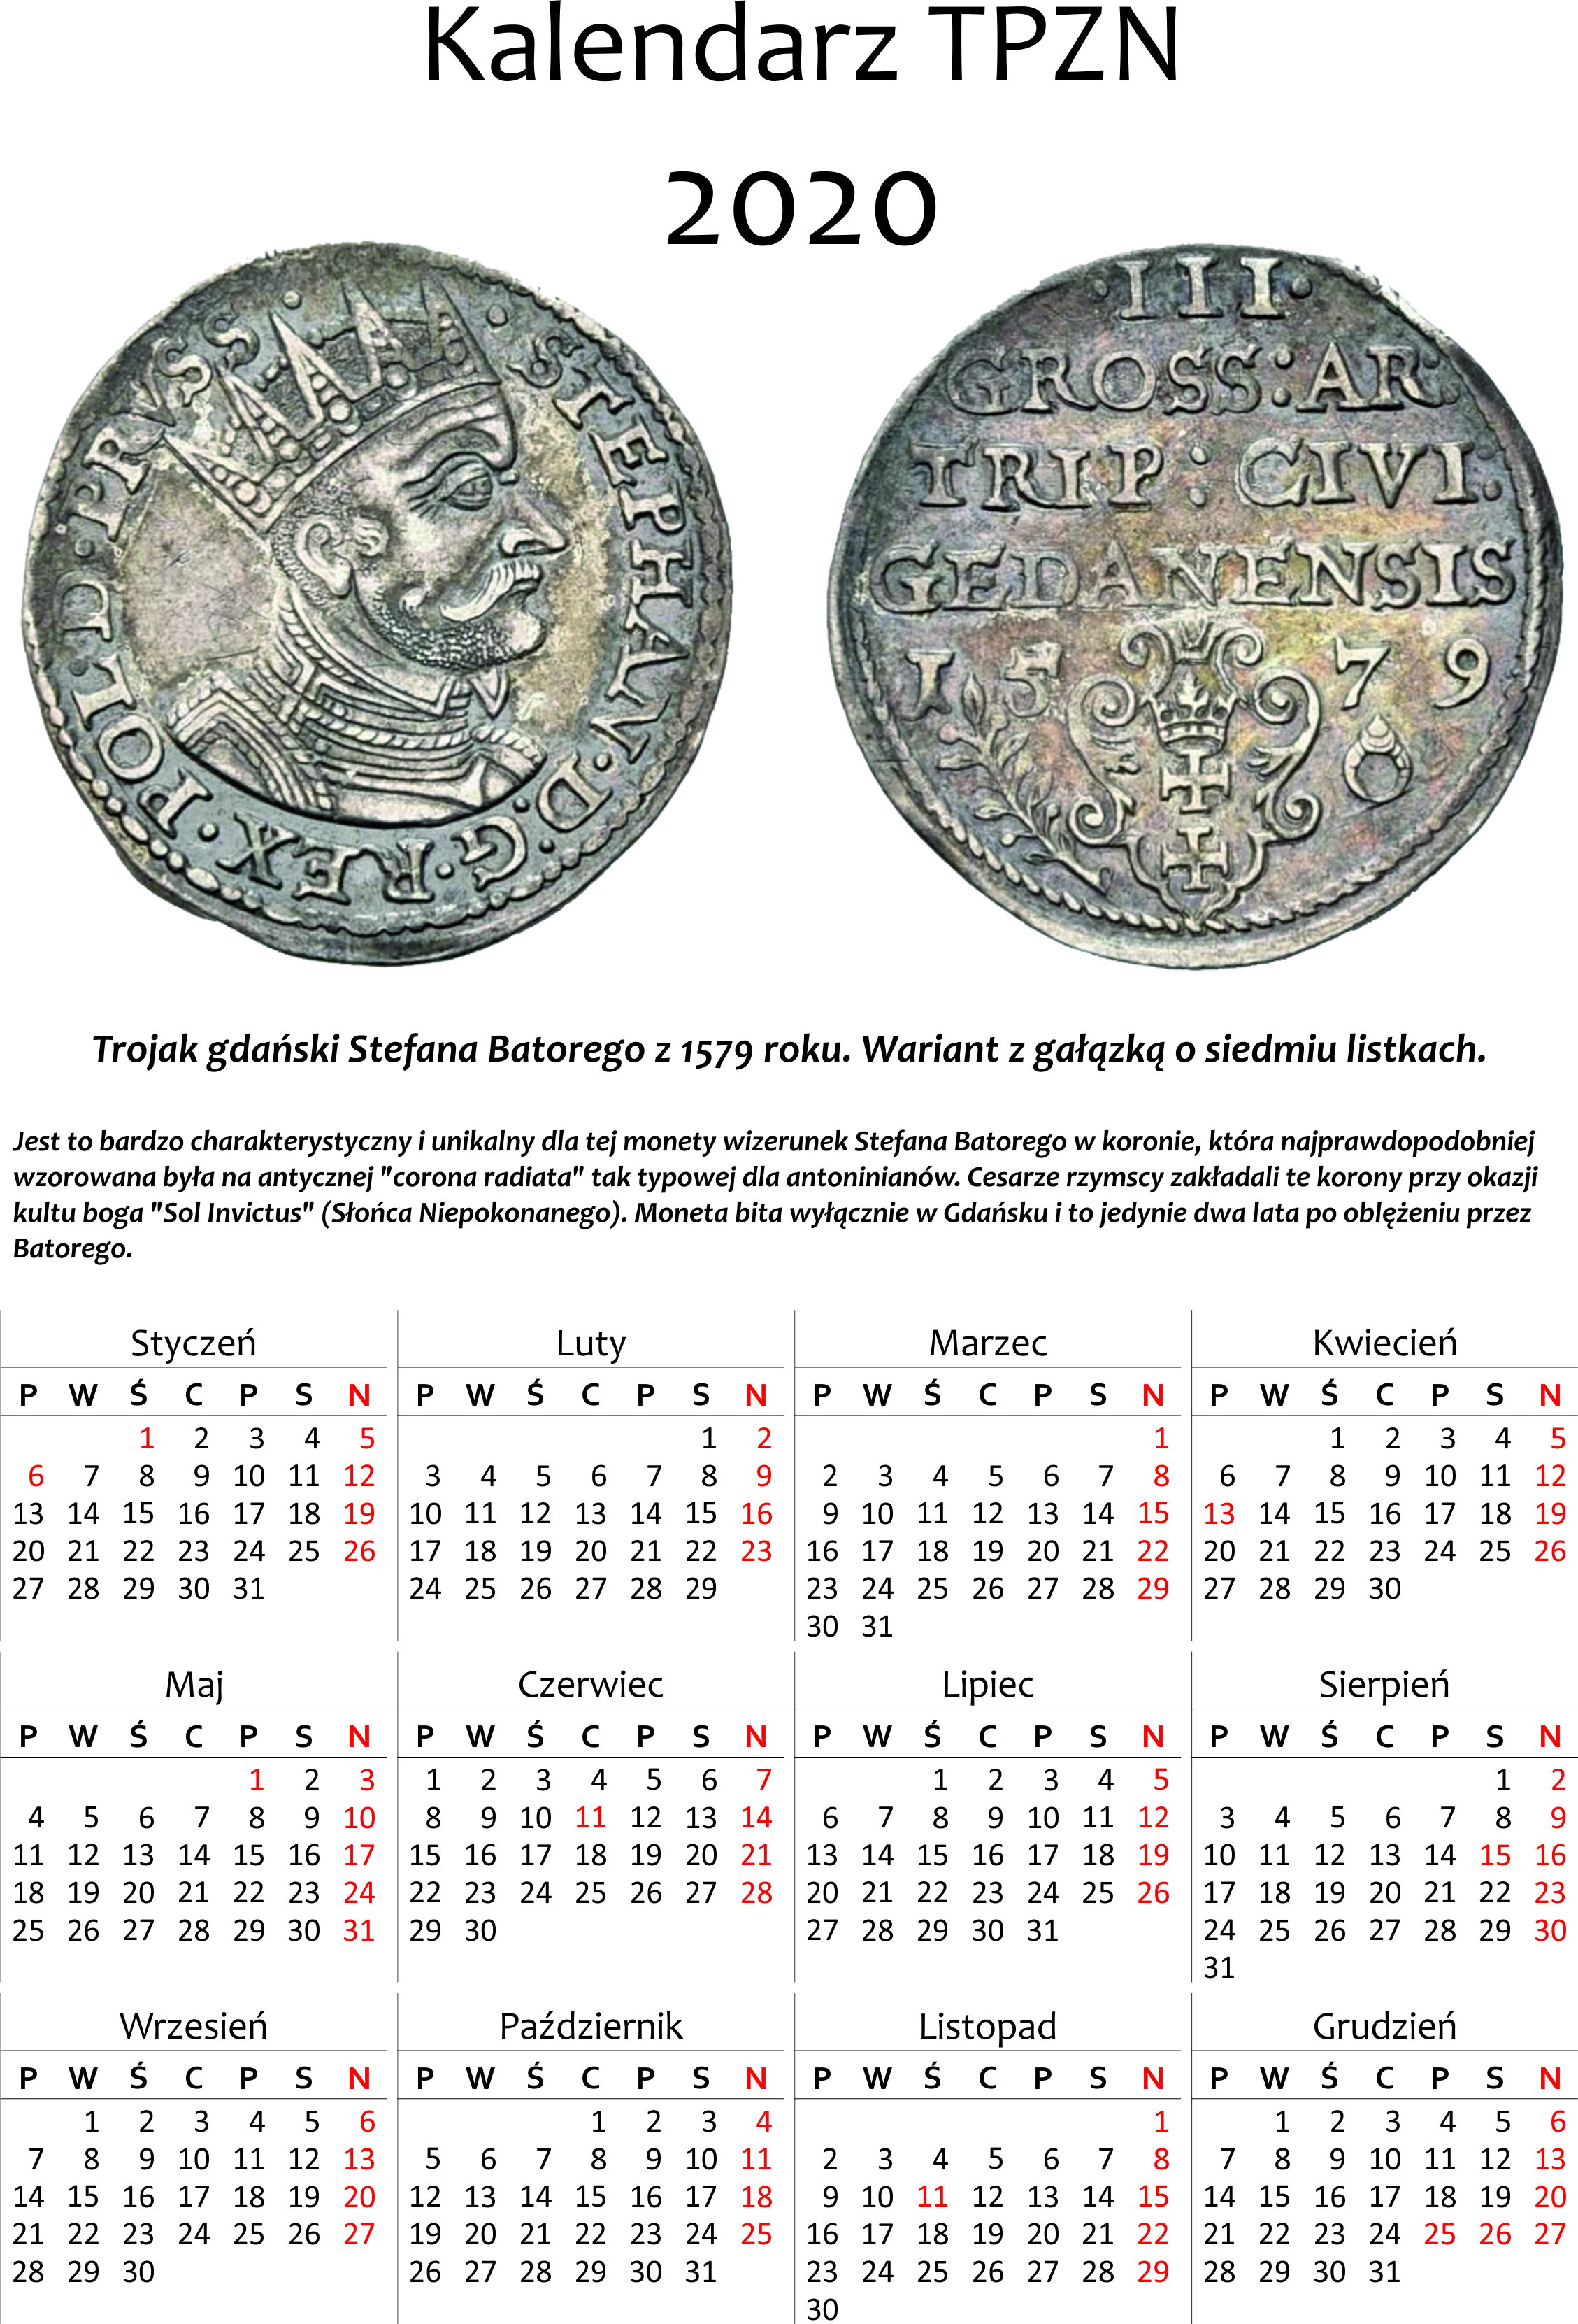 http://info.tpzn.pl/kalendarze/kalendarz2020/glowna.jpg